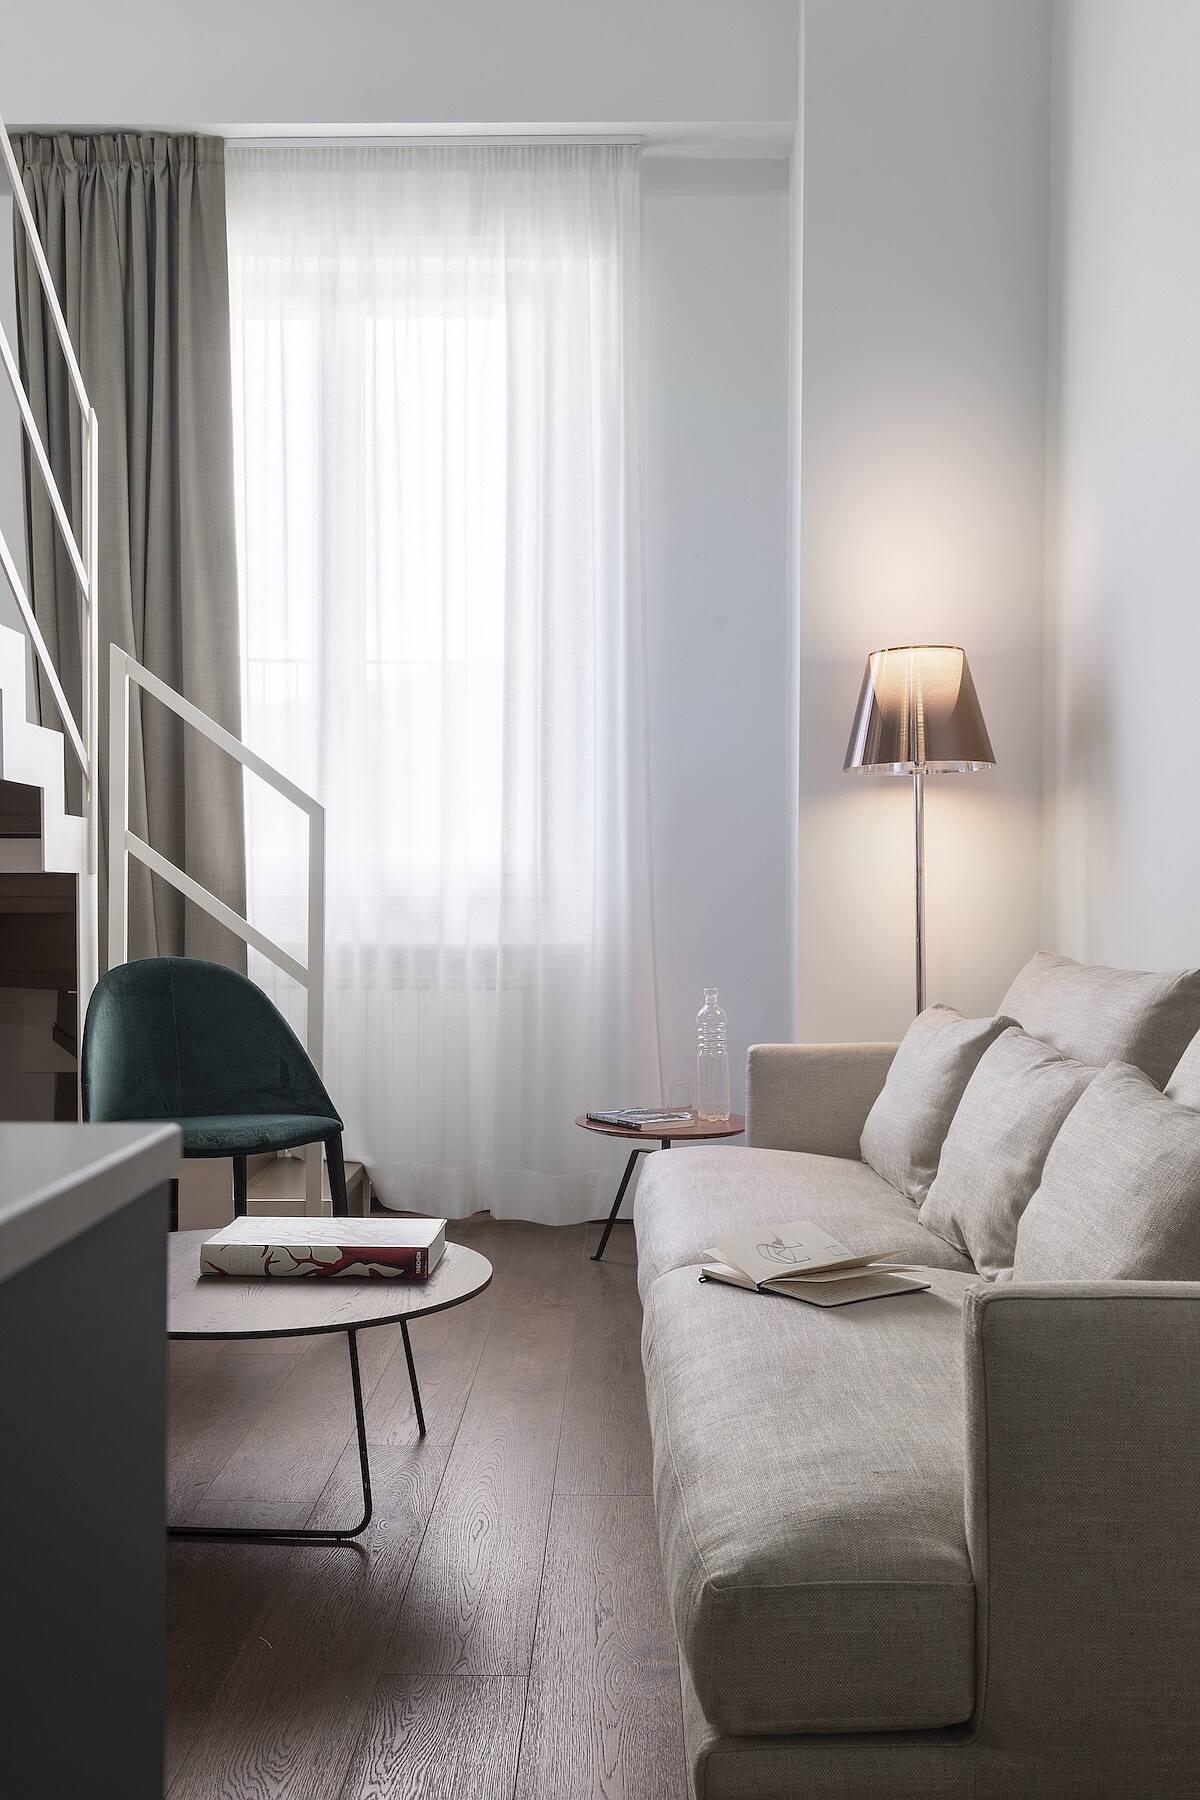 Cavour 82 by Pierattelli Architetture